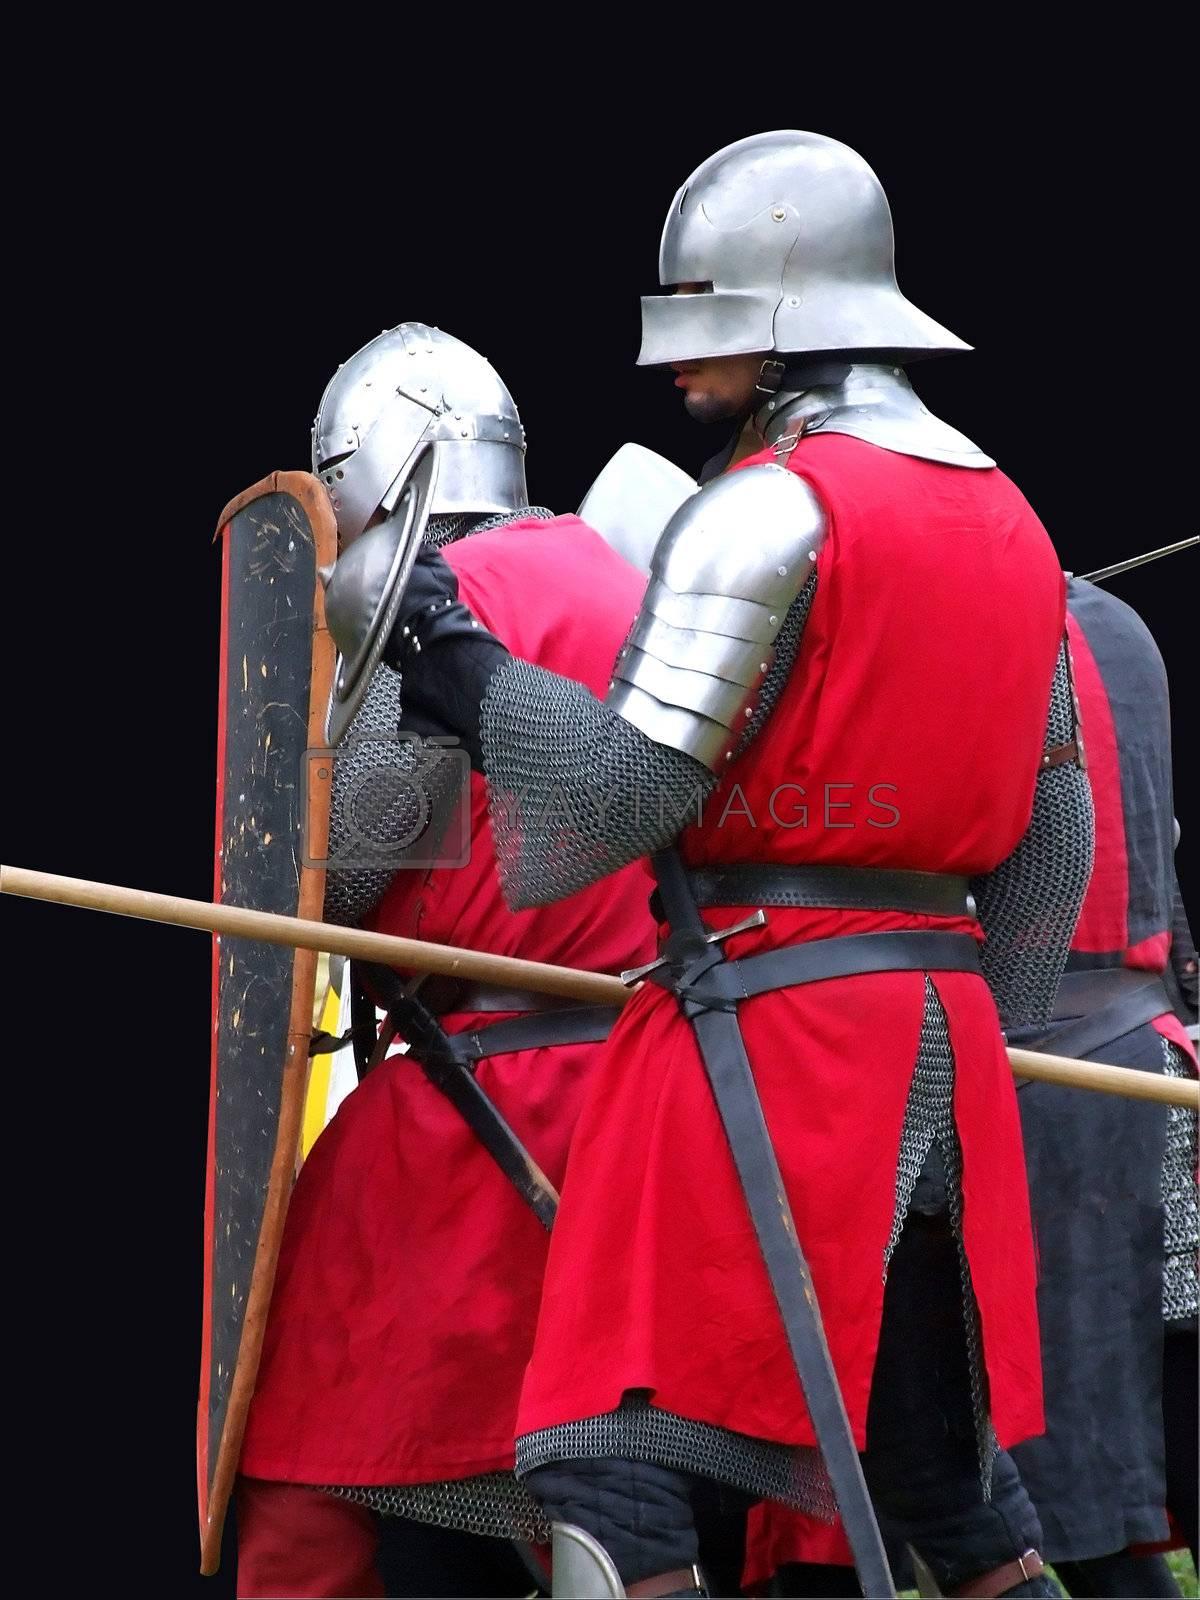 Medieval soldiers in battle by PauloResende